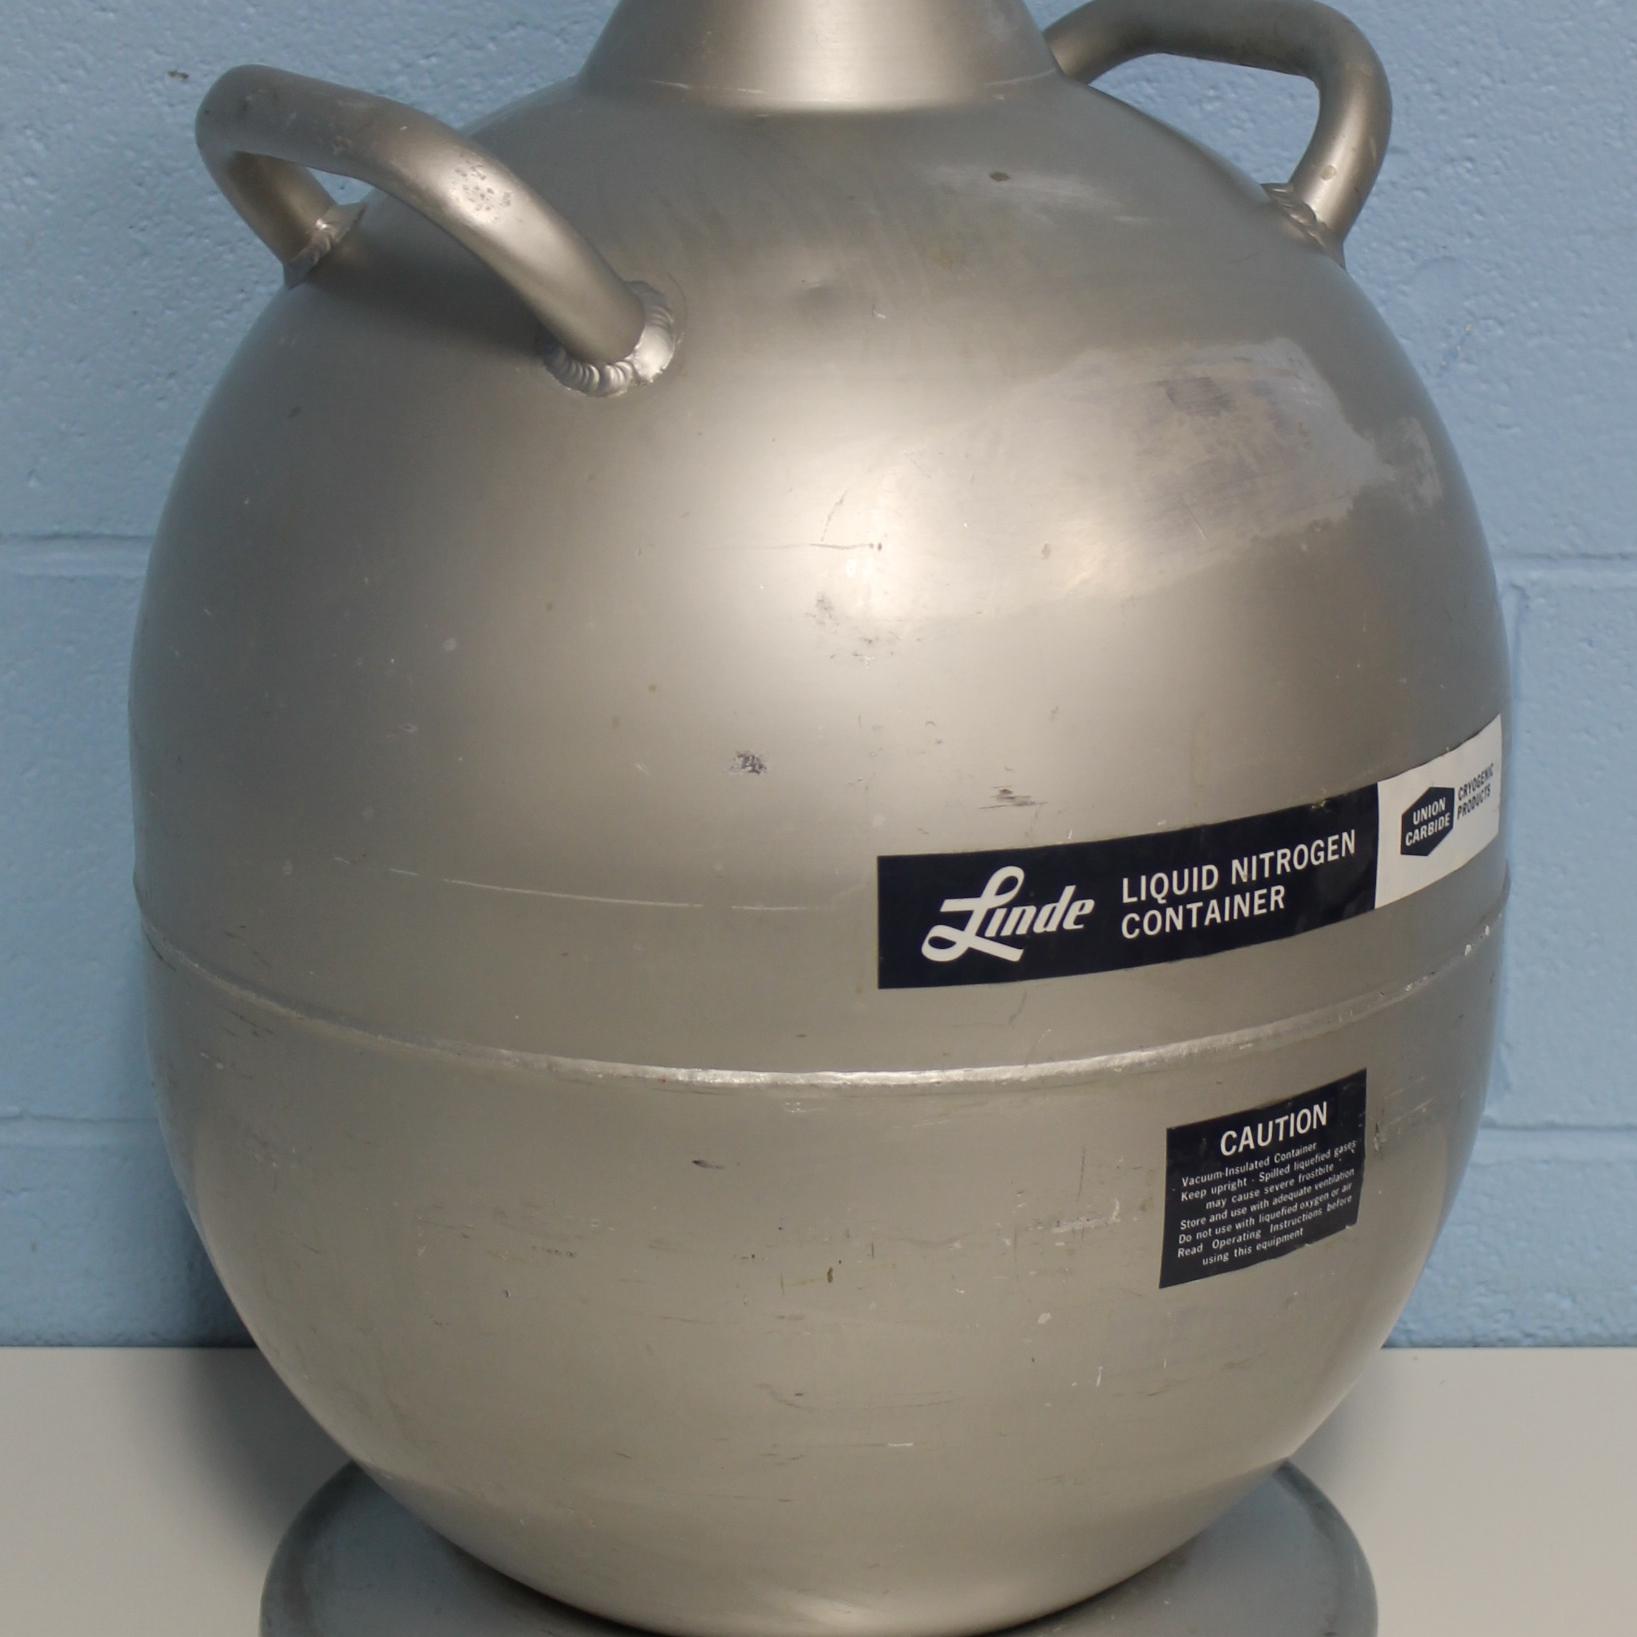 Refurbished Linde Ld 25 Liquid Nitrogen Tank